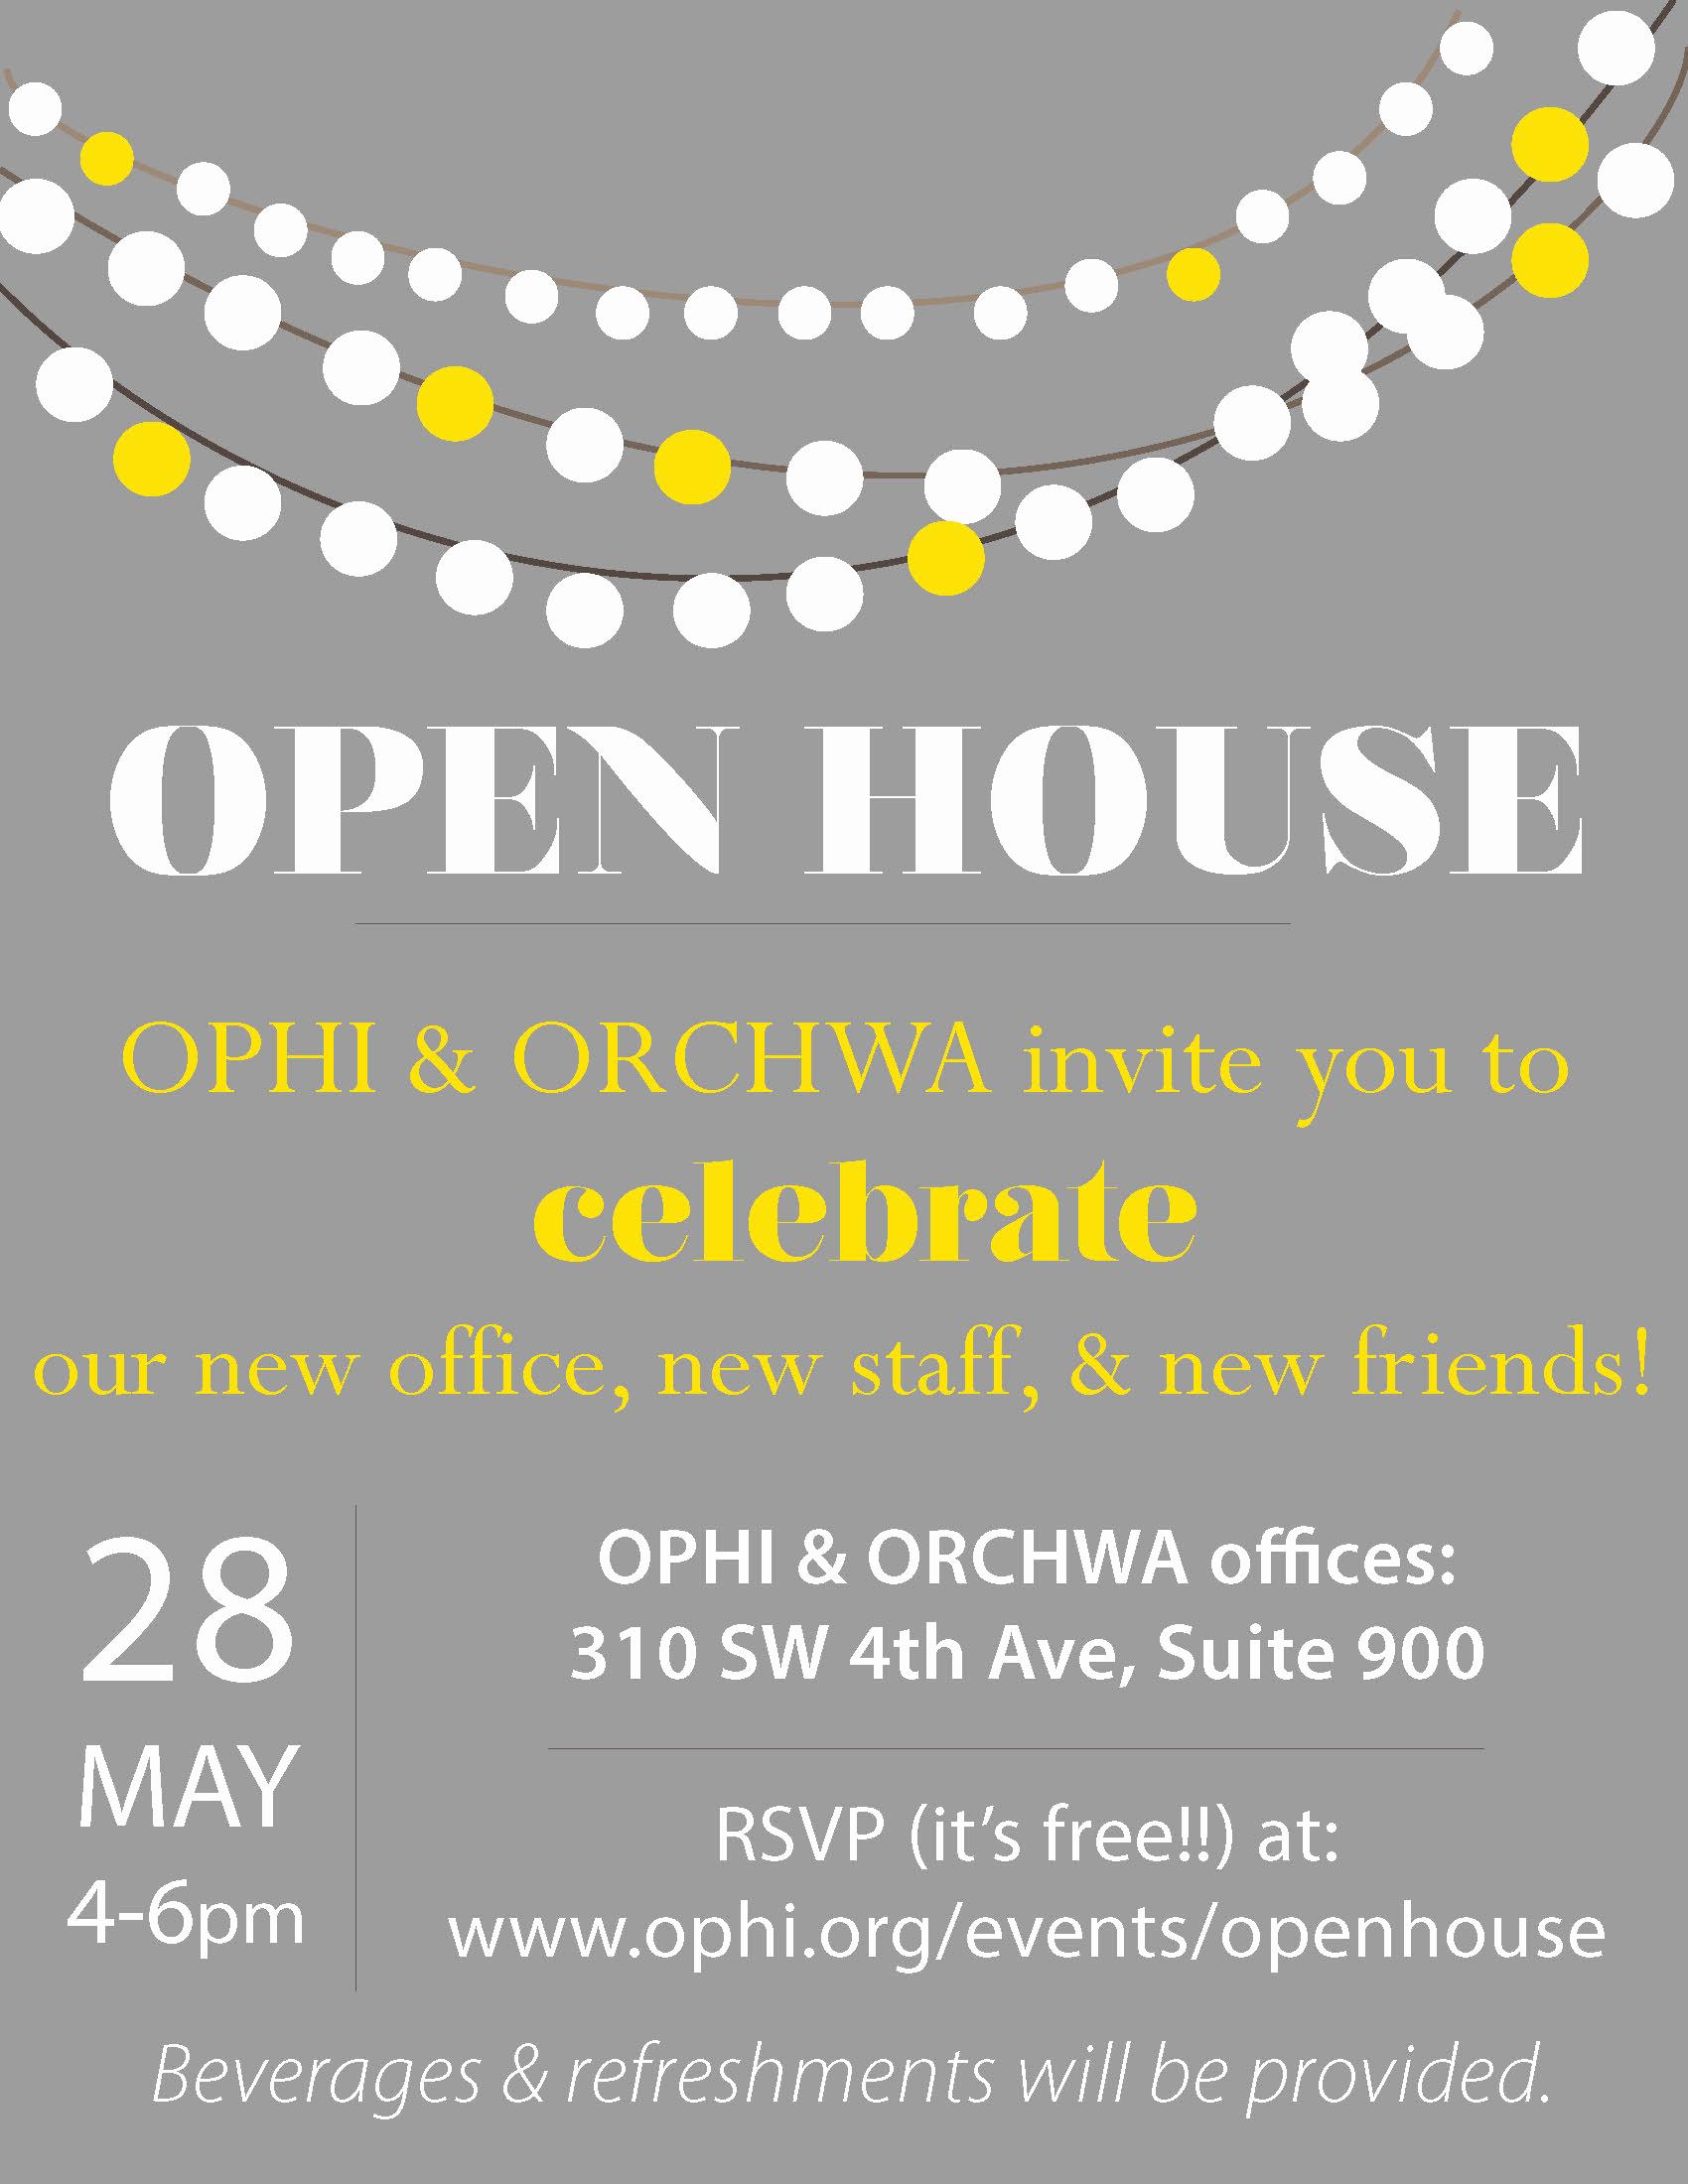 Sample Open House Invitation Elegant Ophi Open House – Ophi